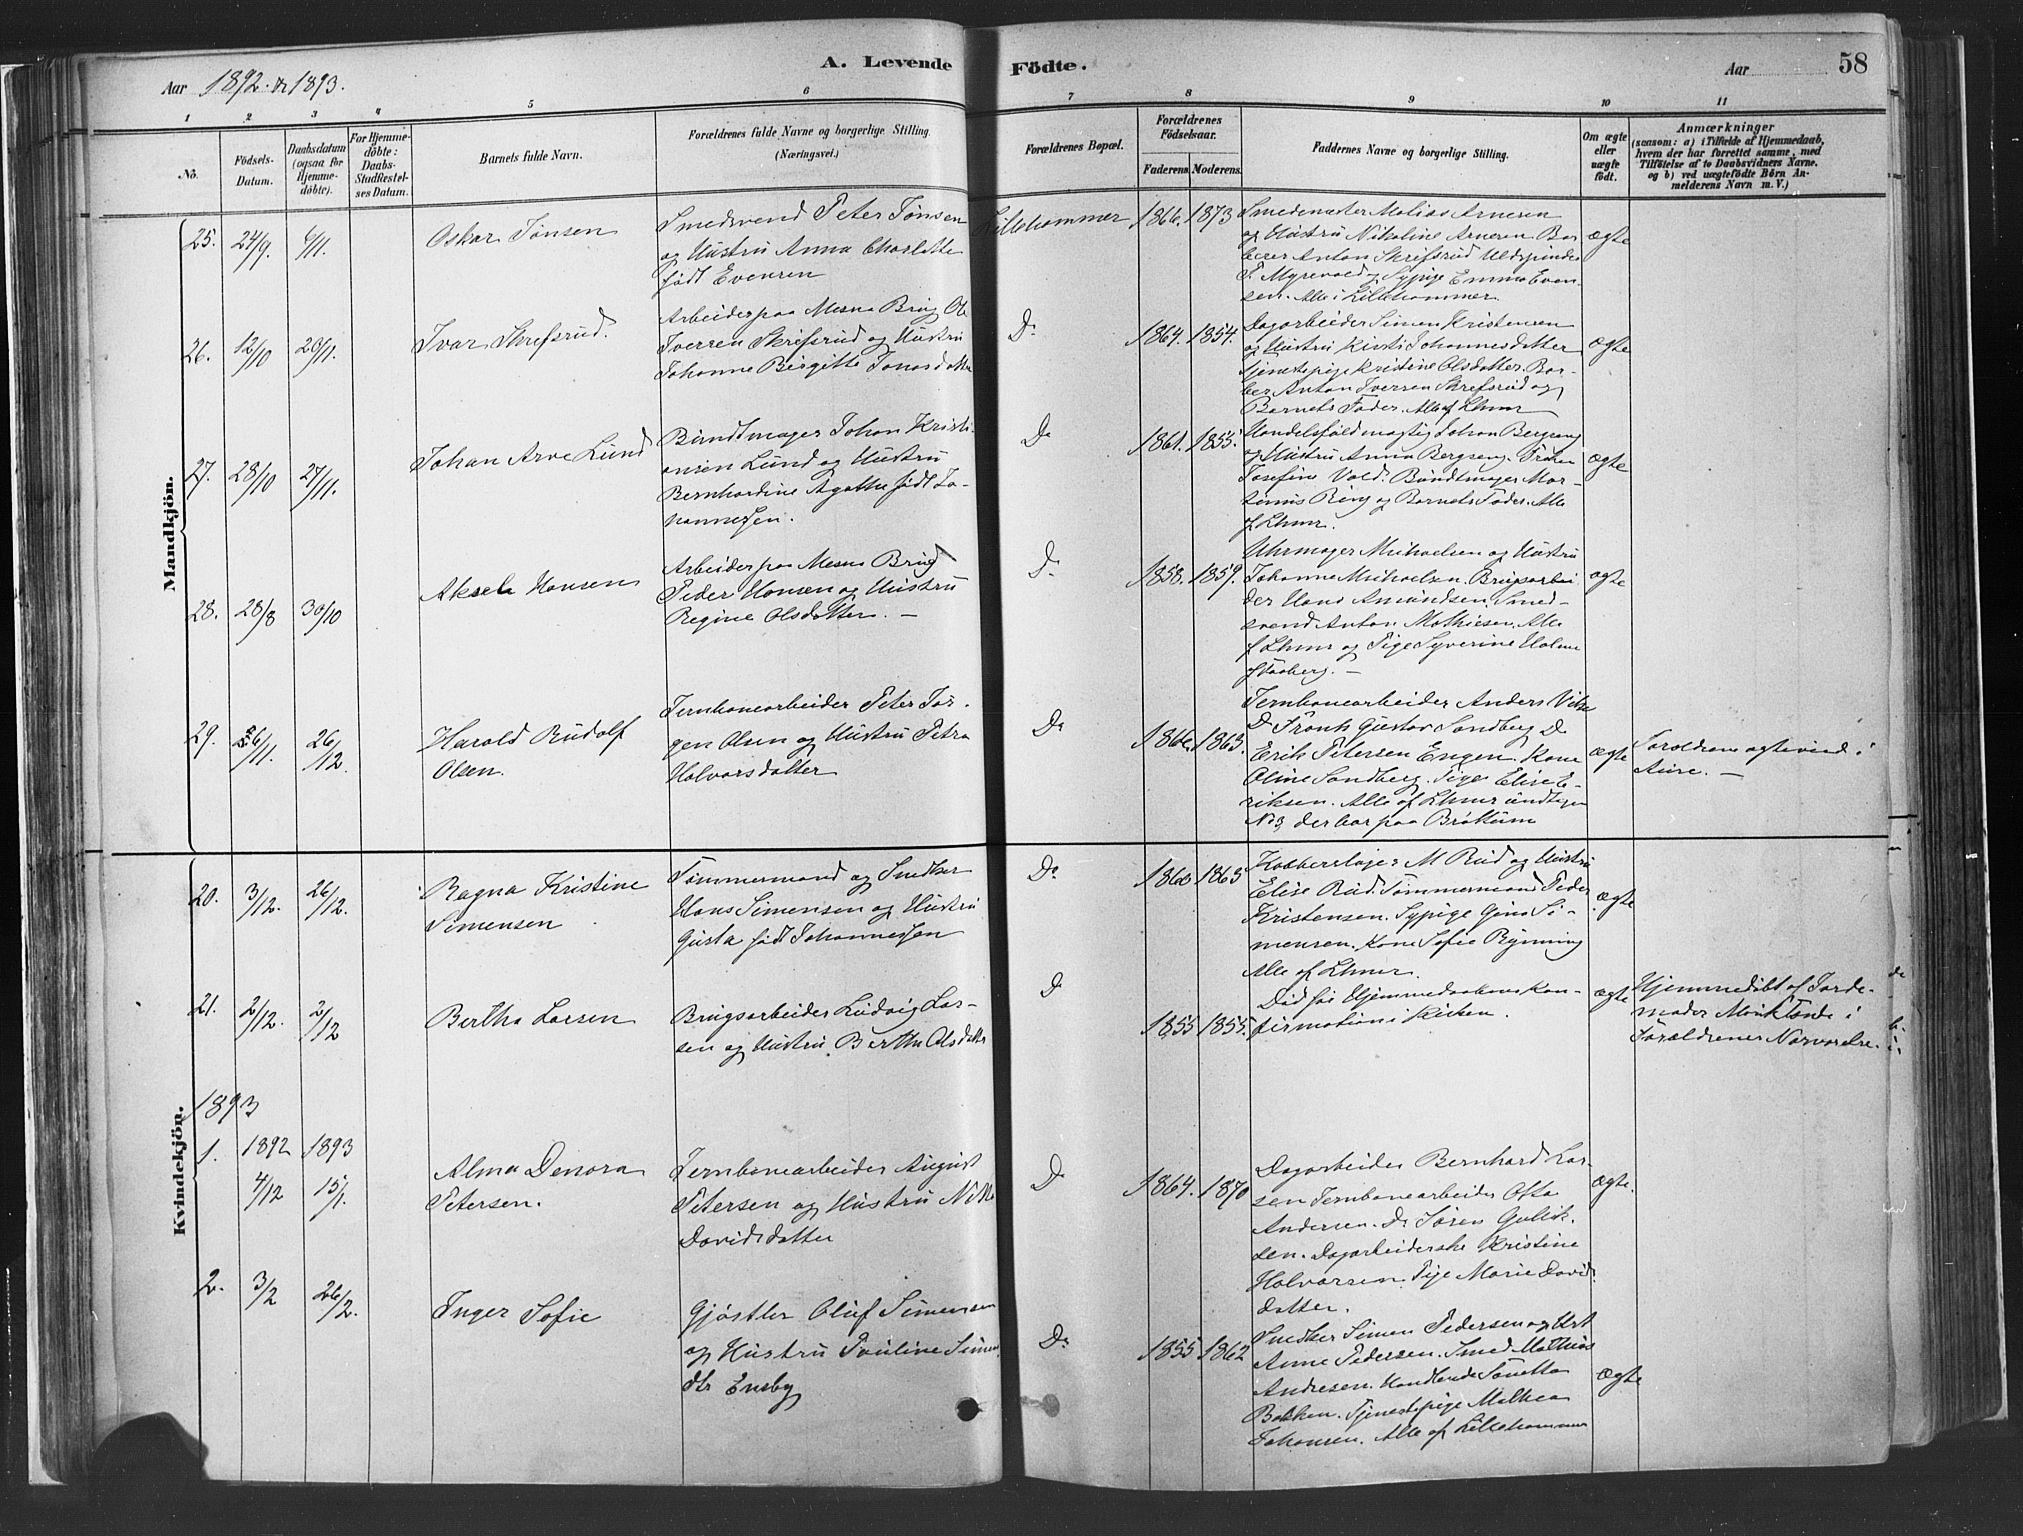 SAH, Fåberg prestekontor, H/Ha/Haa/L0010: Parish register (official) no. 10, 1879-1900, p. 58